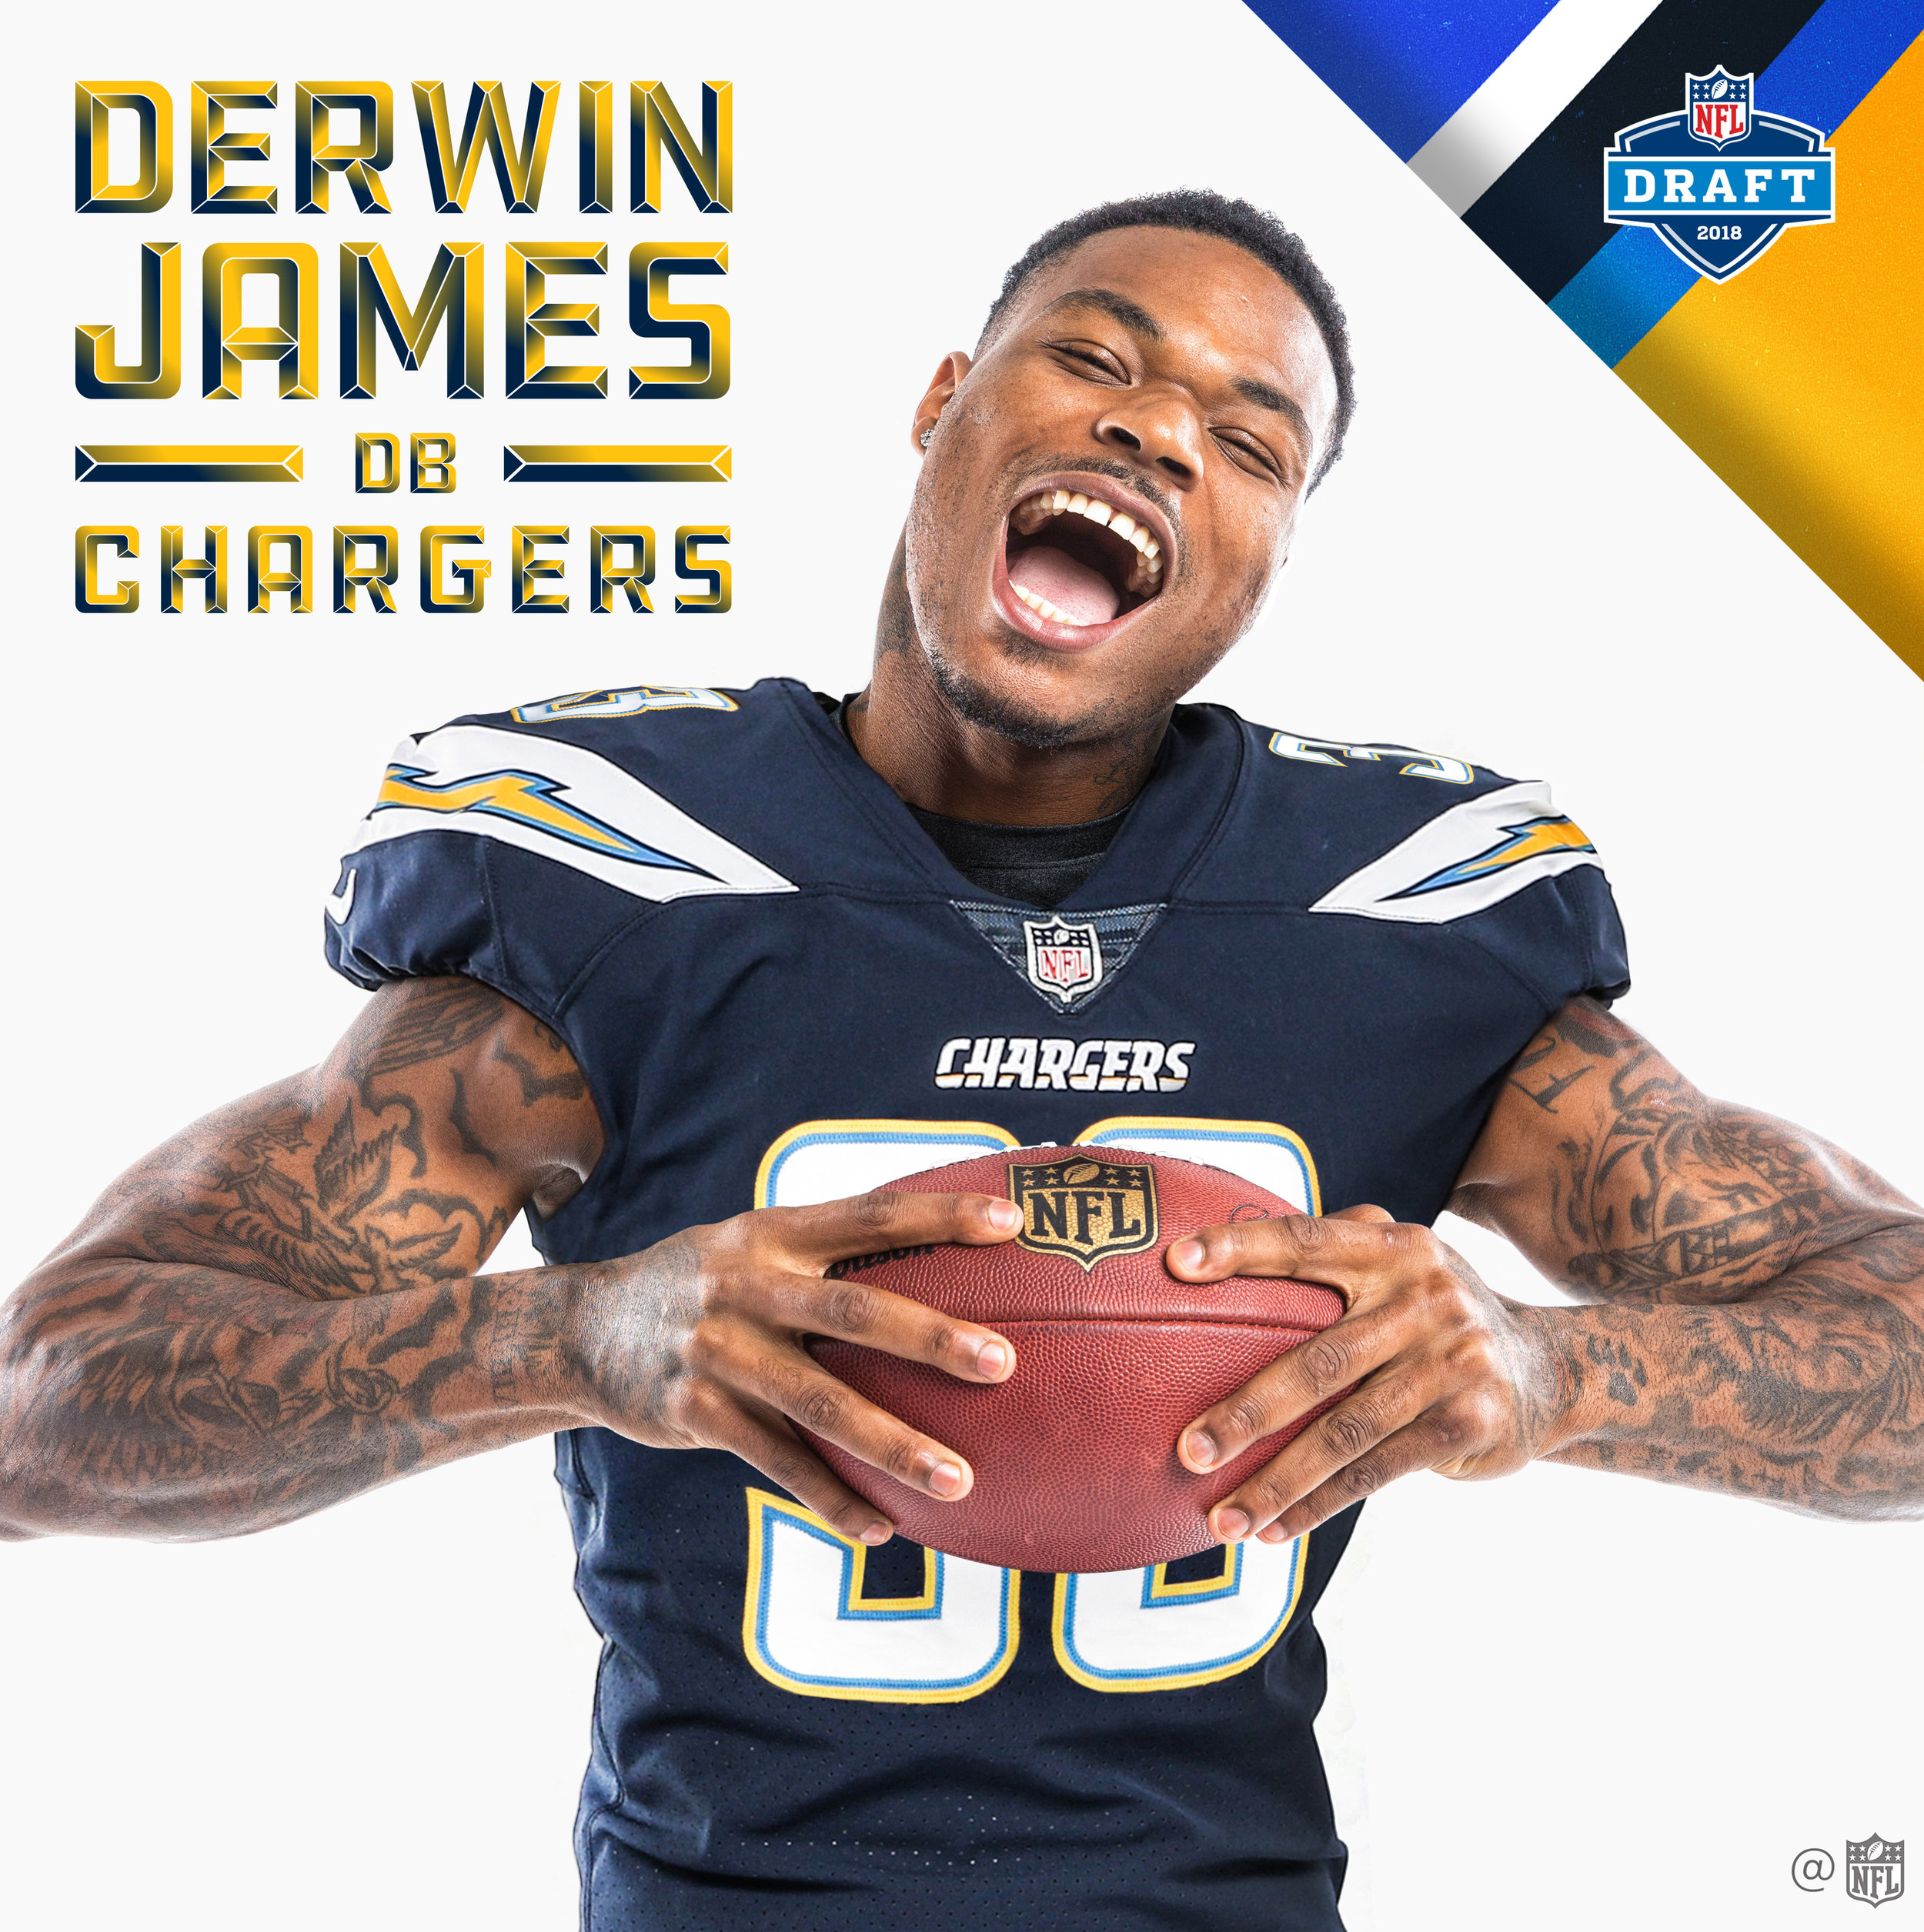 Derwin James_Chargers 33.jpg